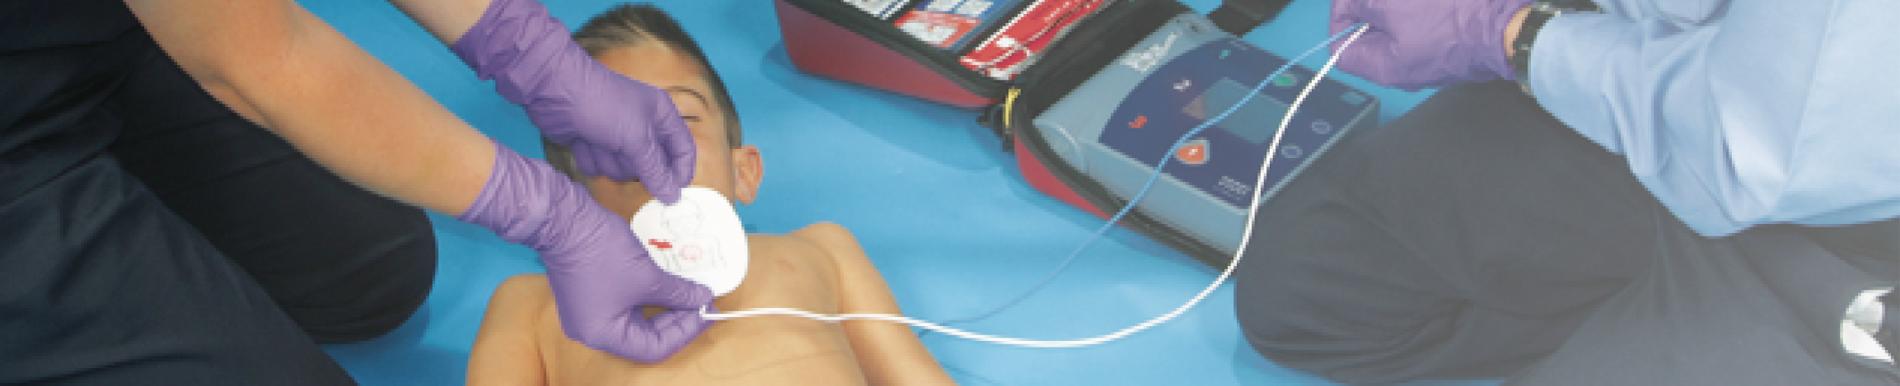 https://www.healthychildren.org/SiteCollectionImage-Homepage-Banners/AED_Child_EMT_homepage.jpg